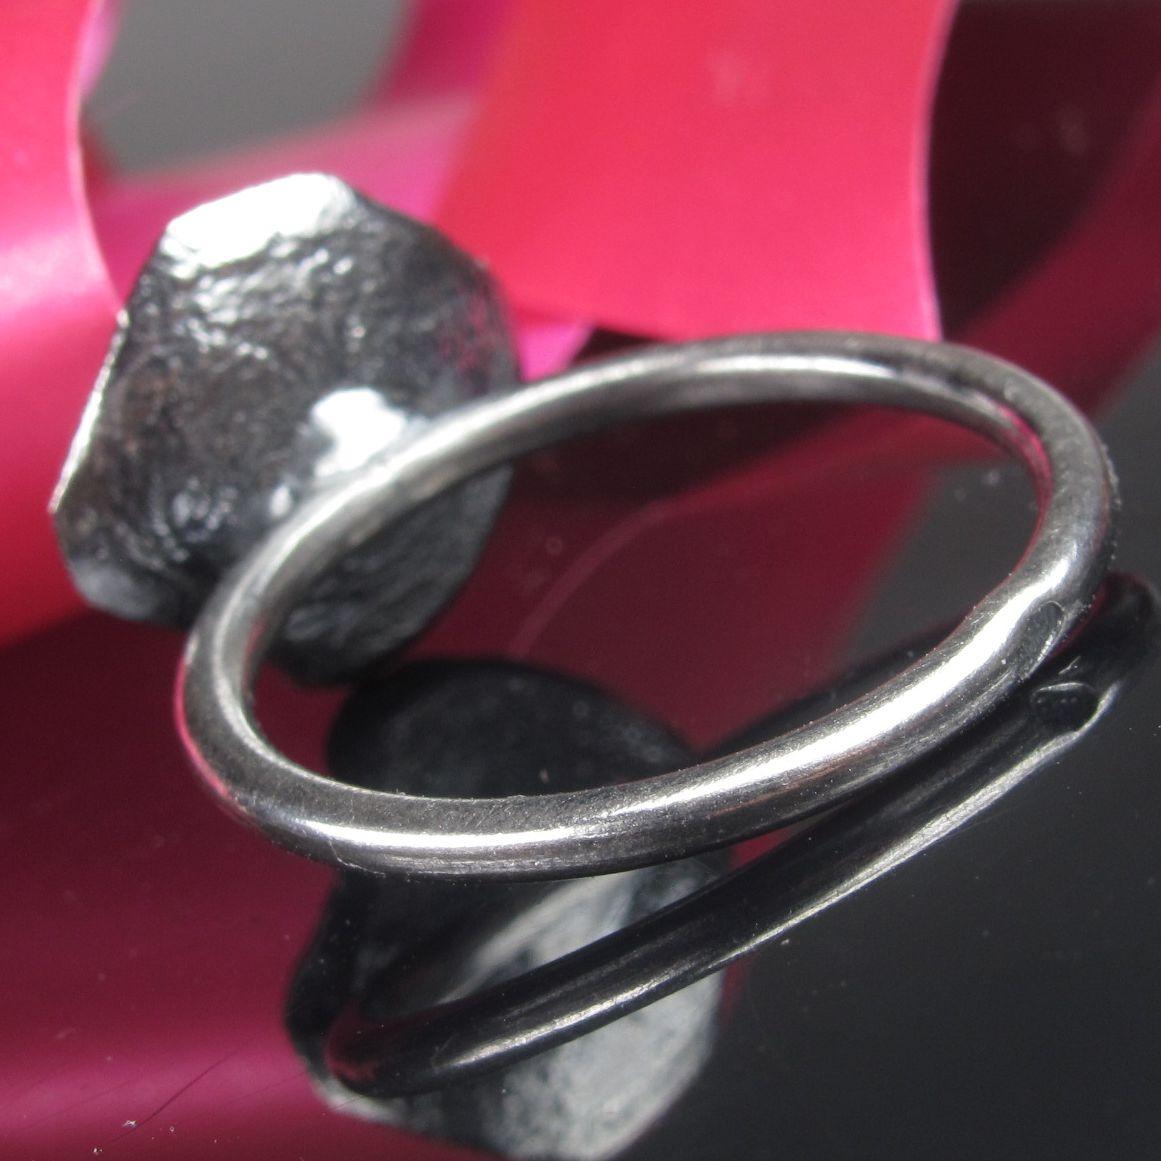 Sodalith Echt Silber Sterling 925 Ring Gr60 Silberring Damen Verlobung Unikat  eBay